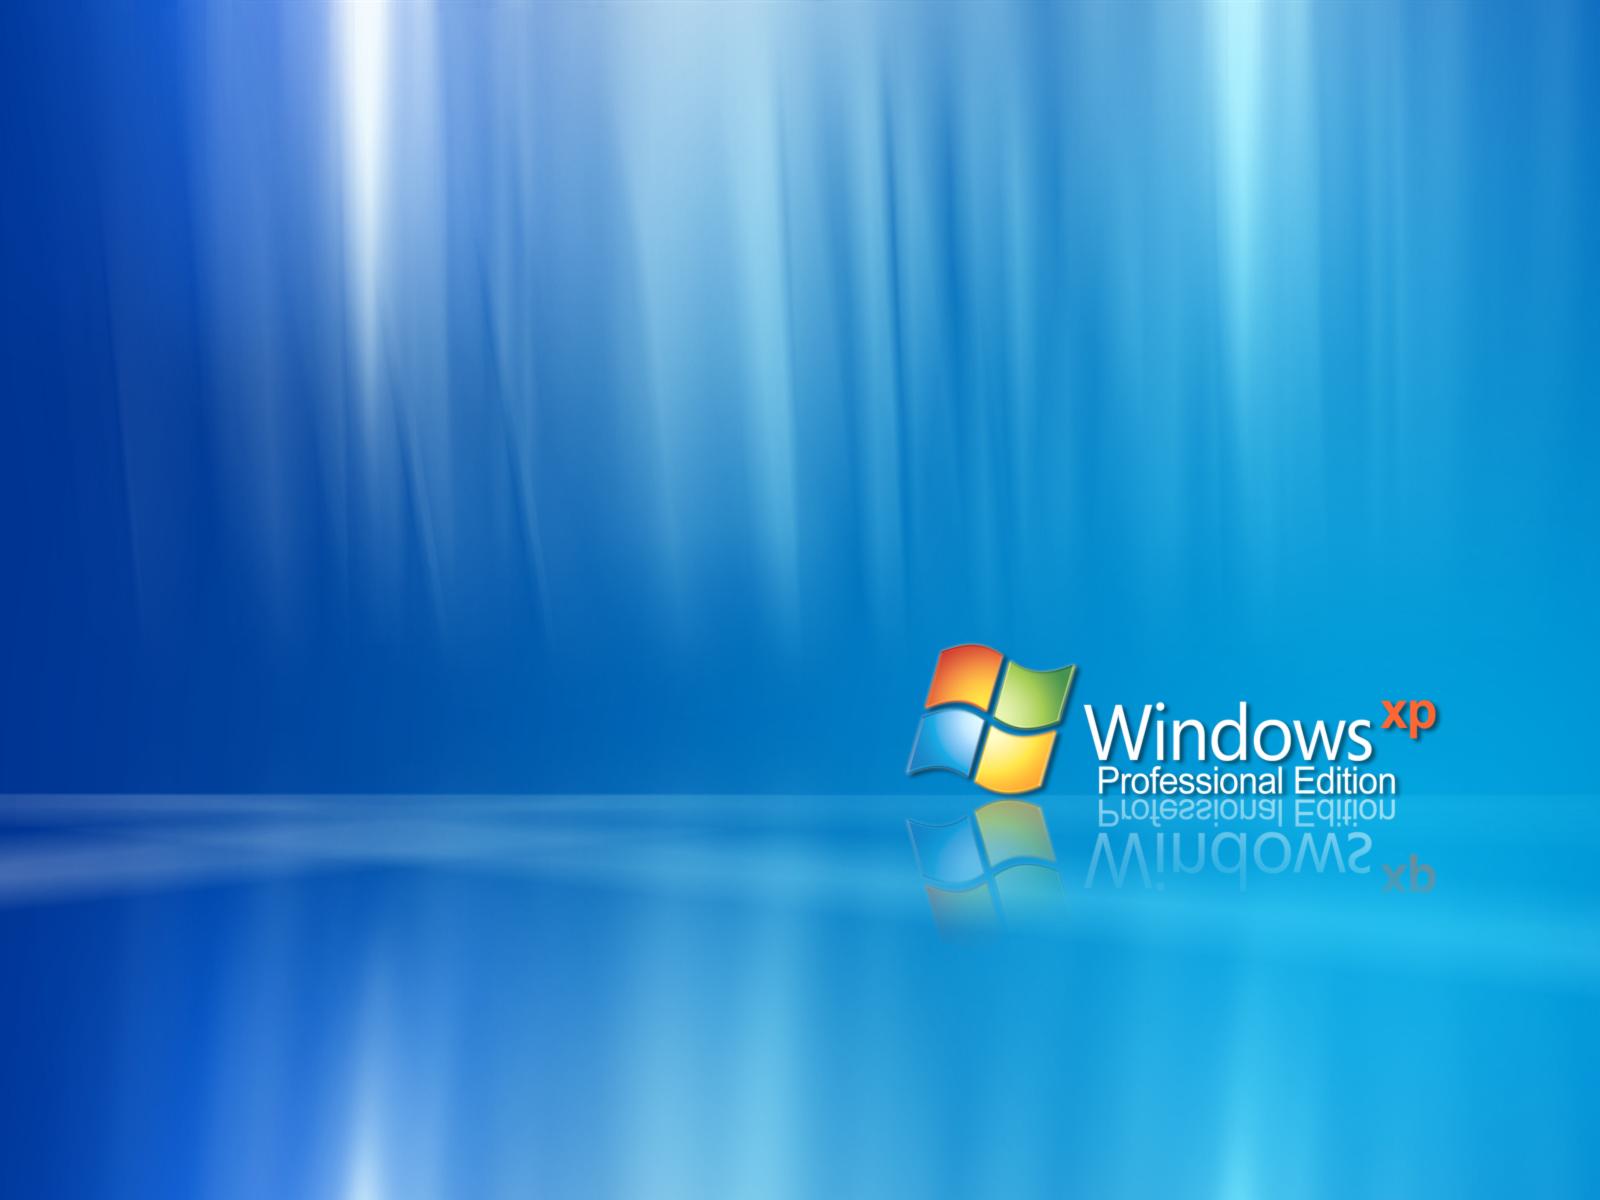 windows xp wallpapers - Free Desktop Wallpaper